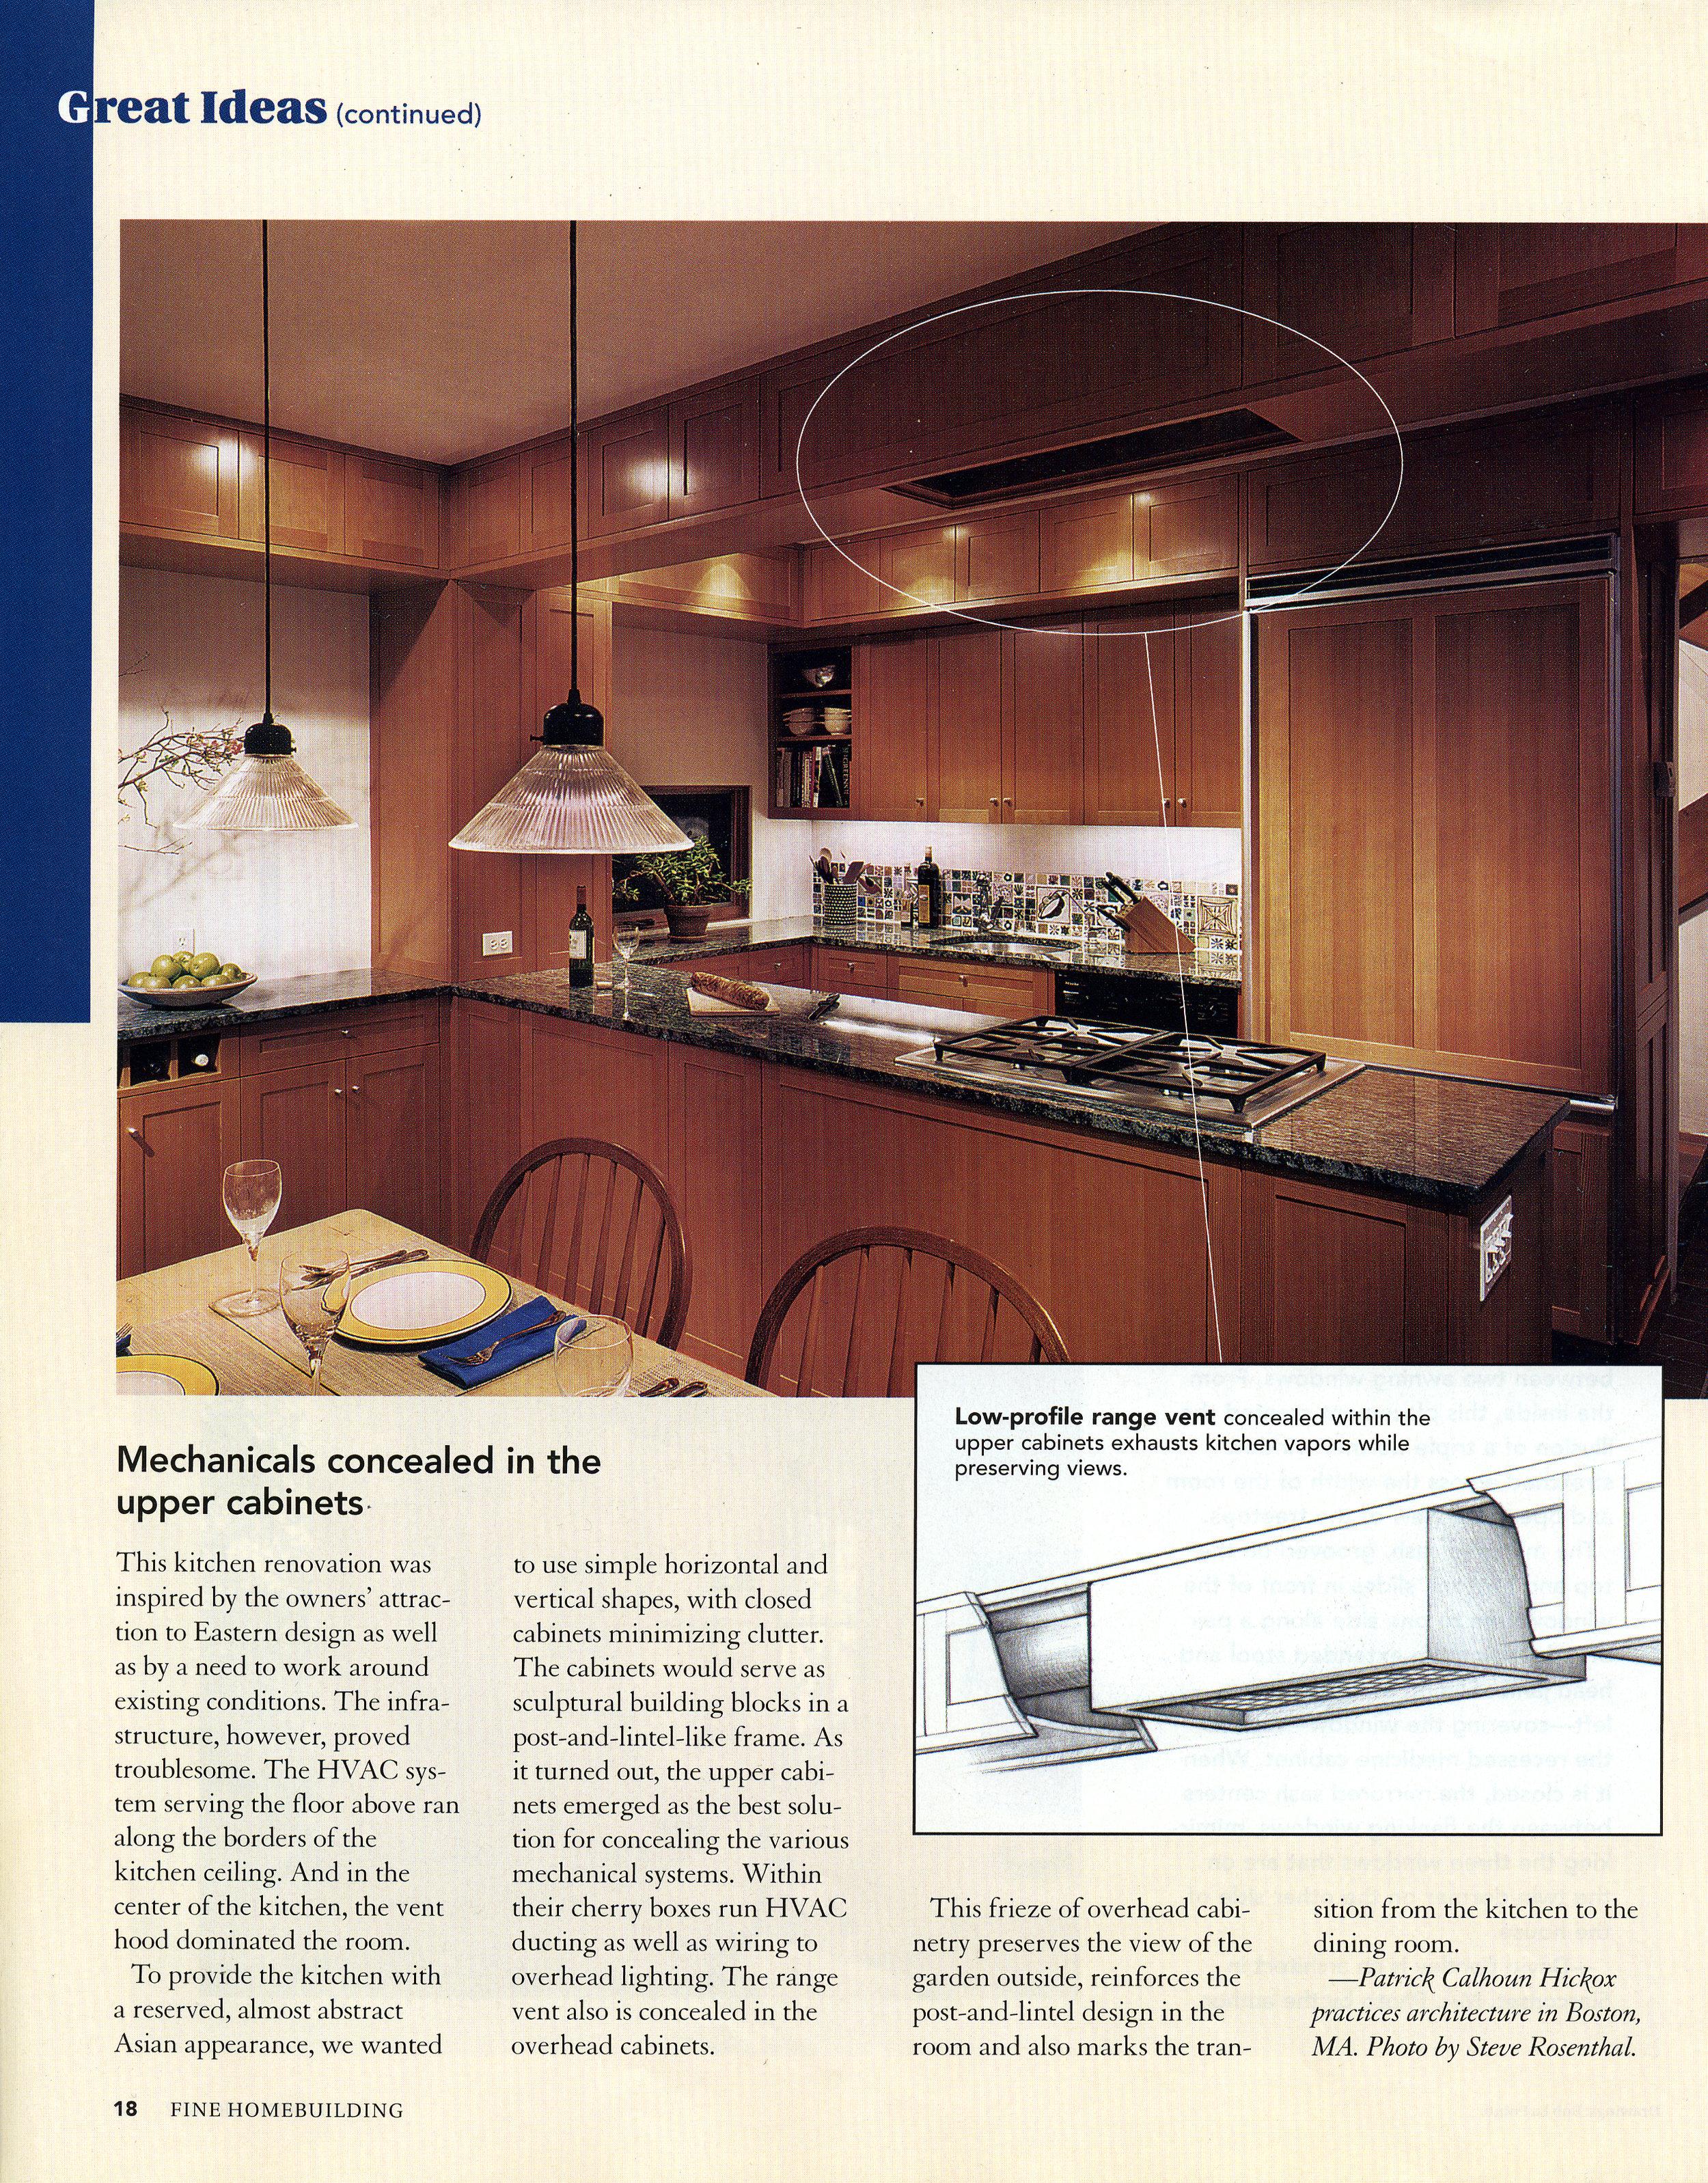 Fine homebuilding page 2007.jpg